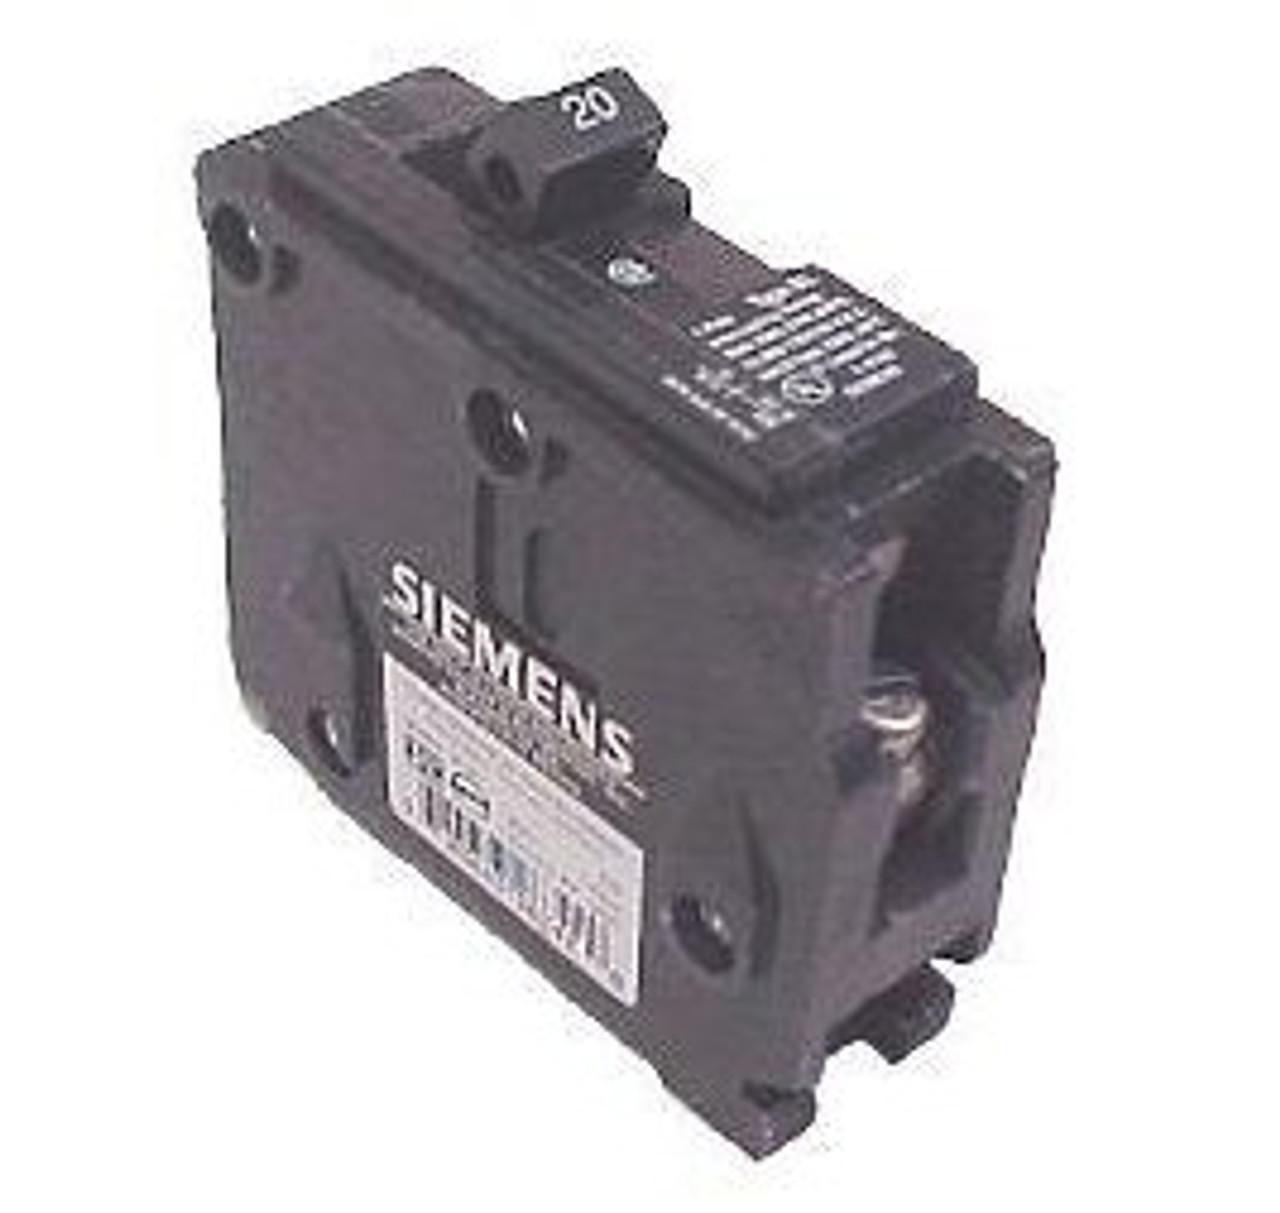 Siemens B120 1 Pole 20 Amp 120VAC Type BL Circuit Breaker - Used